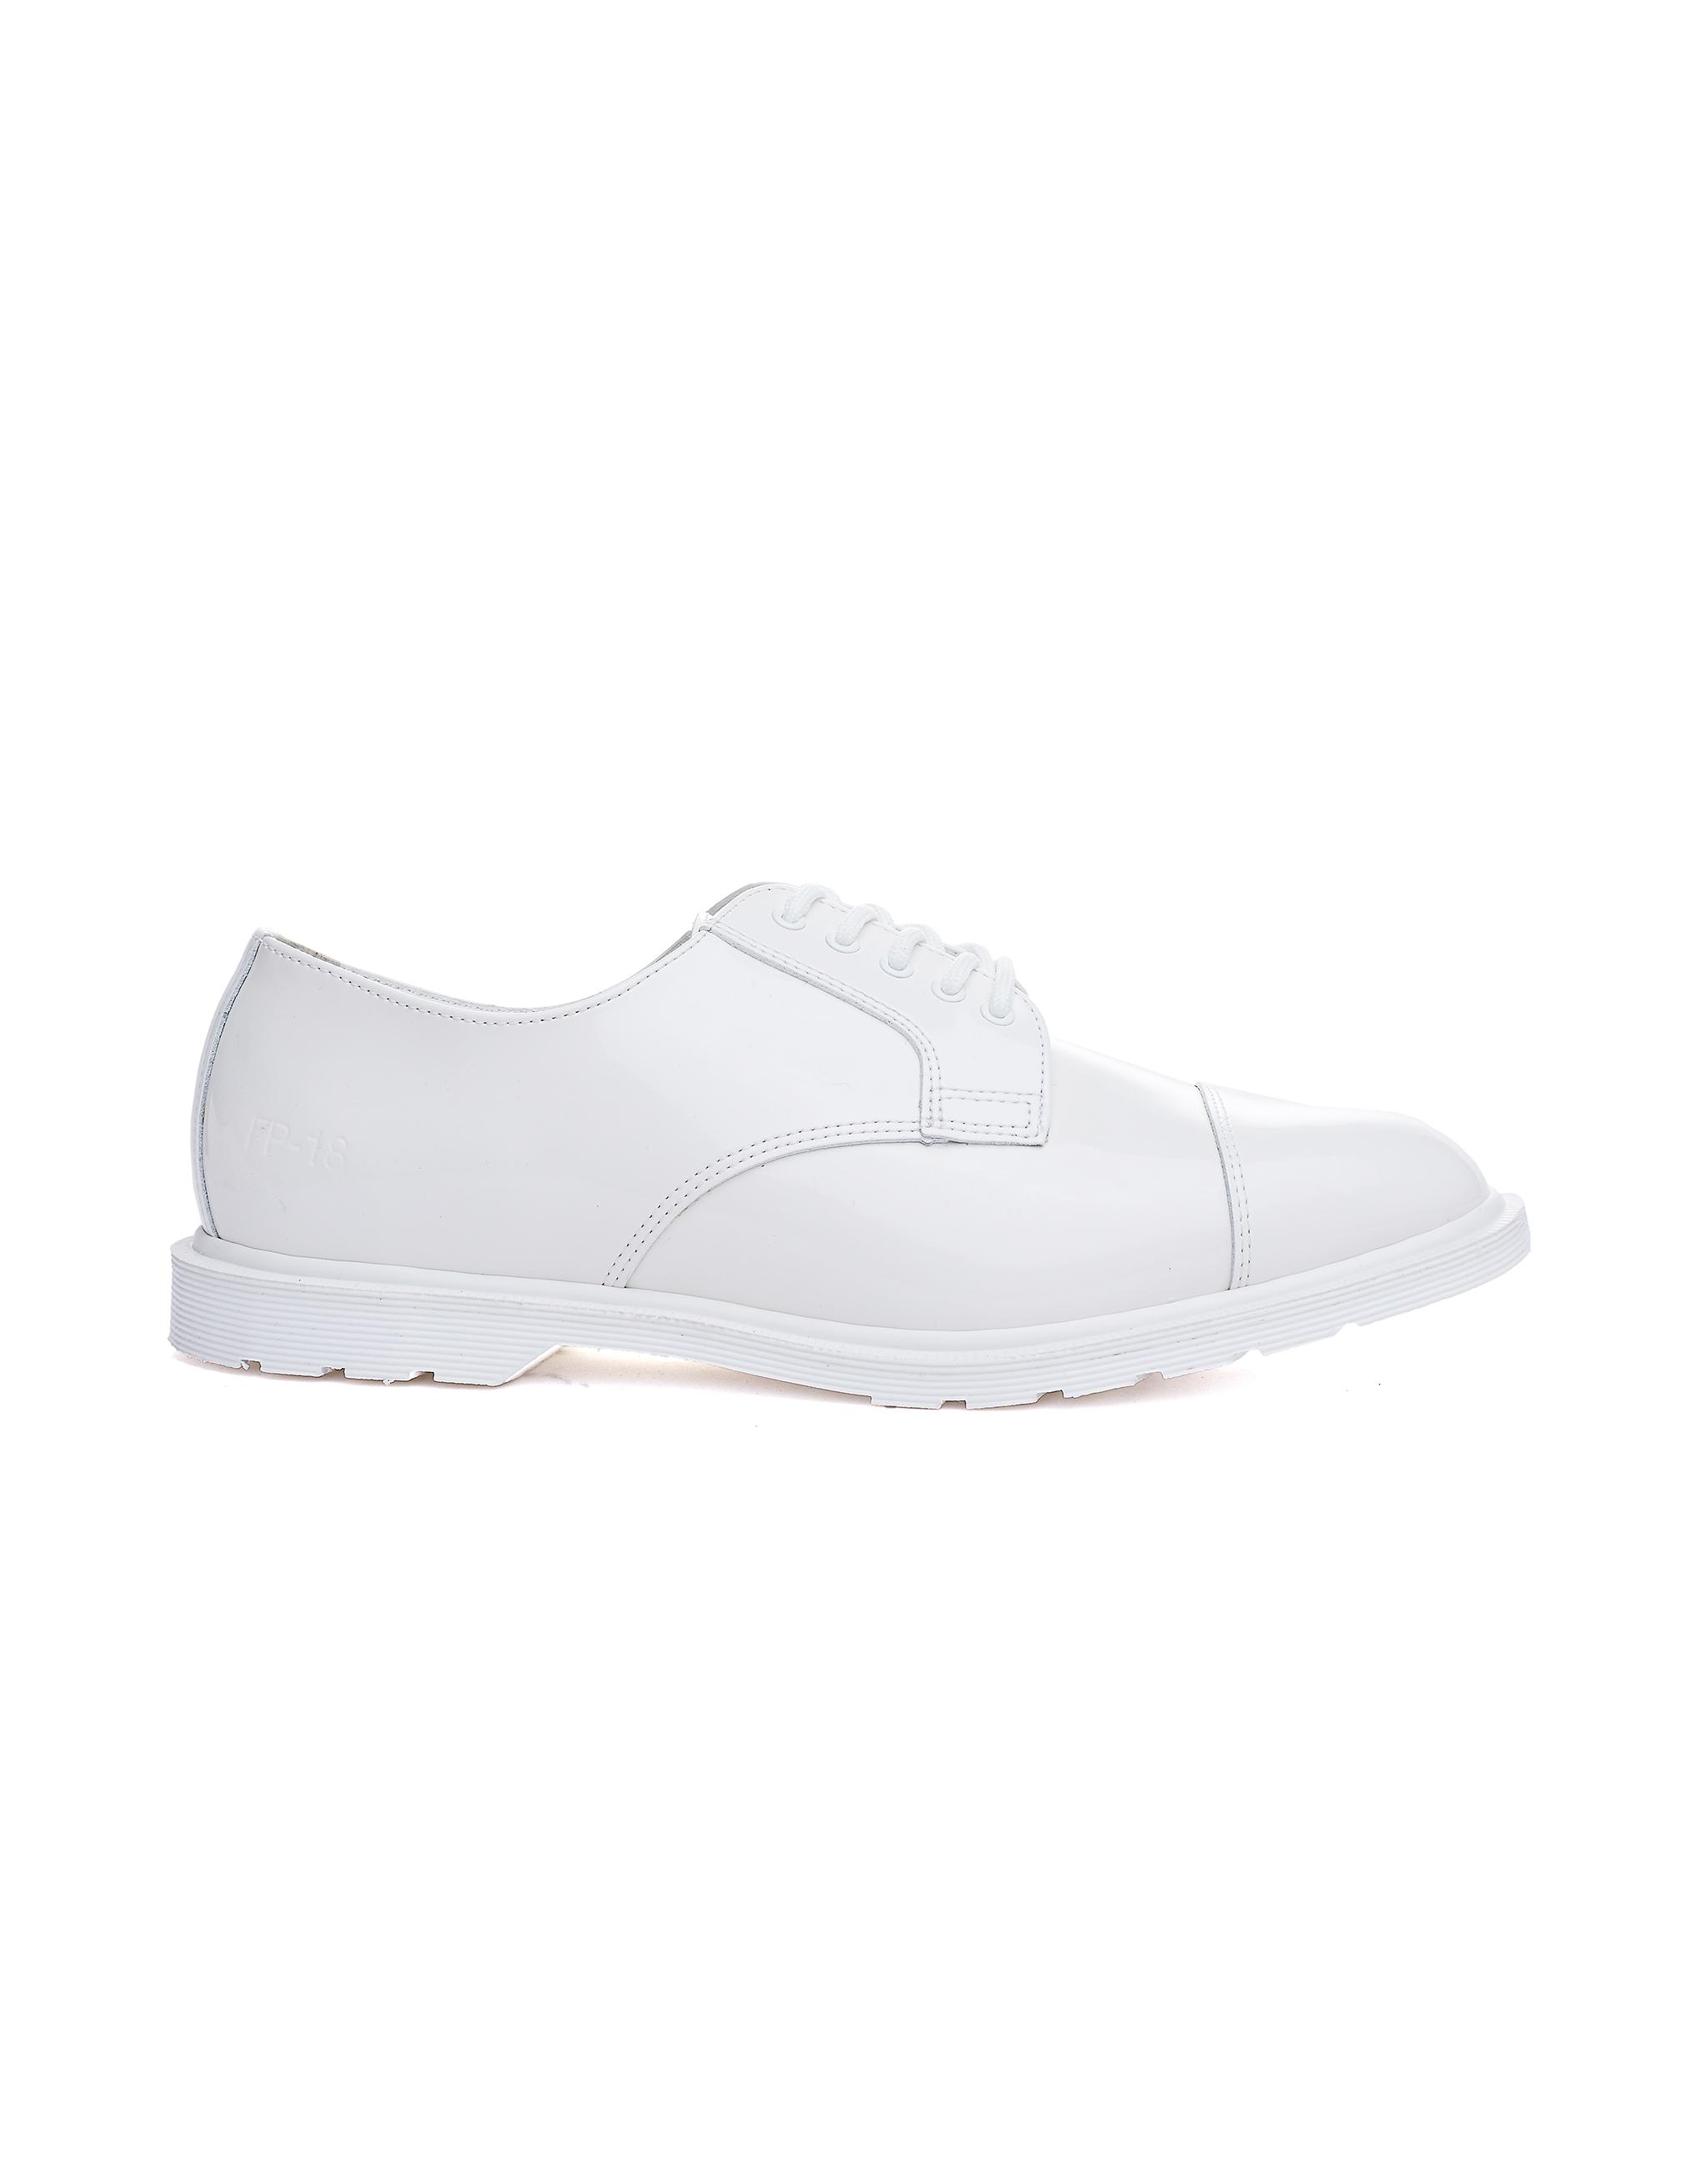 Gosha Rubchinskiy White Dr.Martens Leather Boots